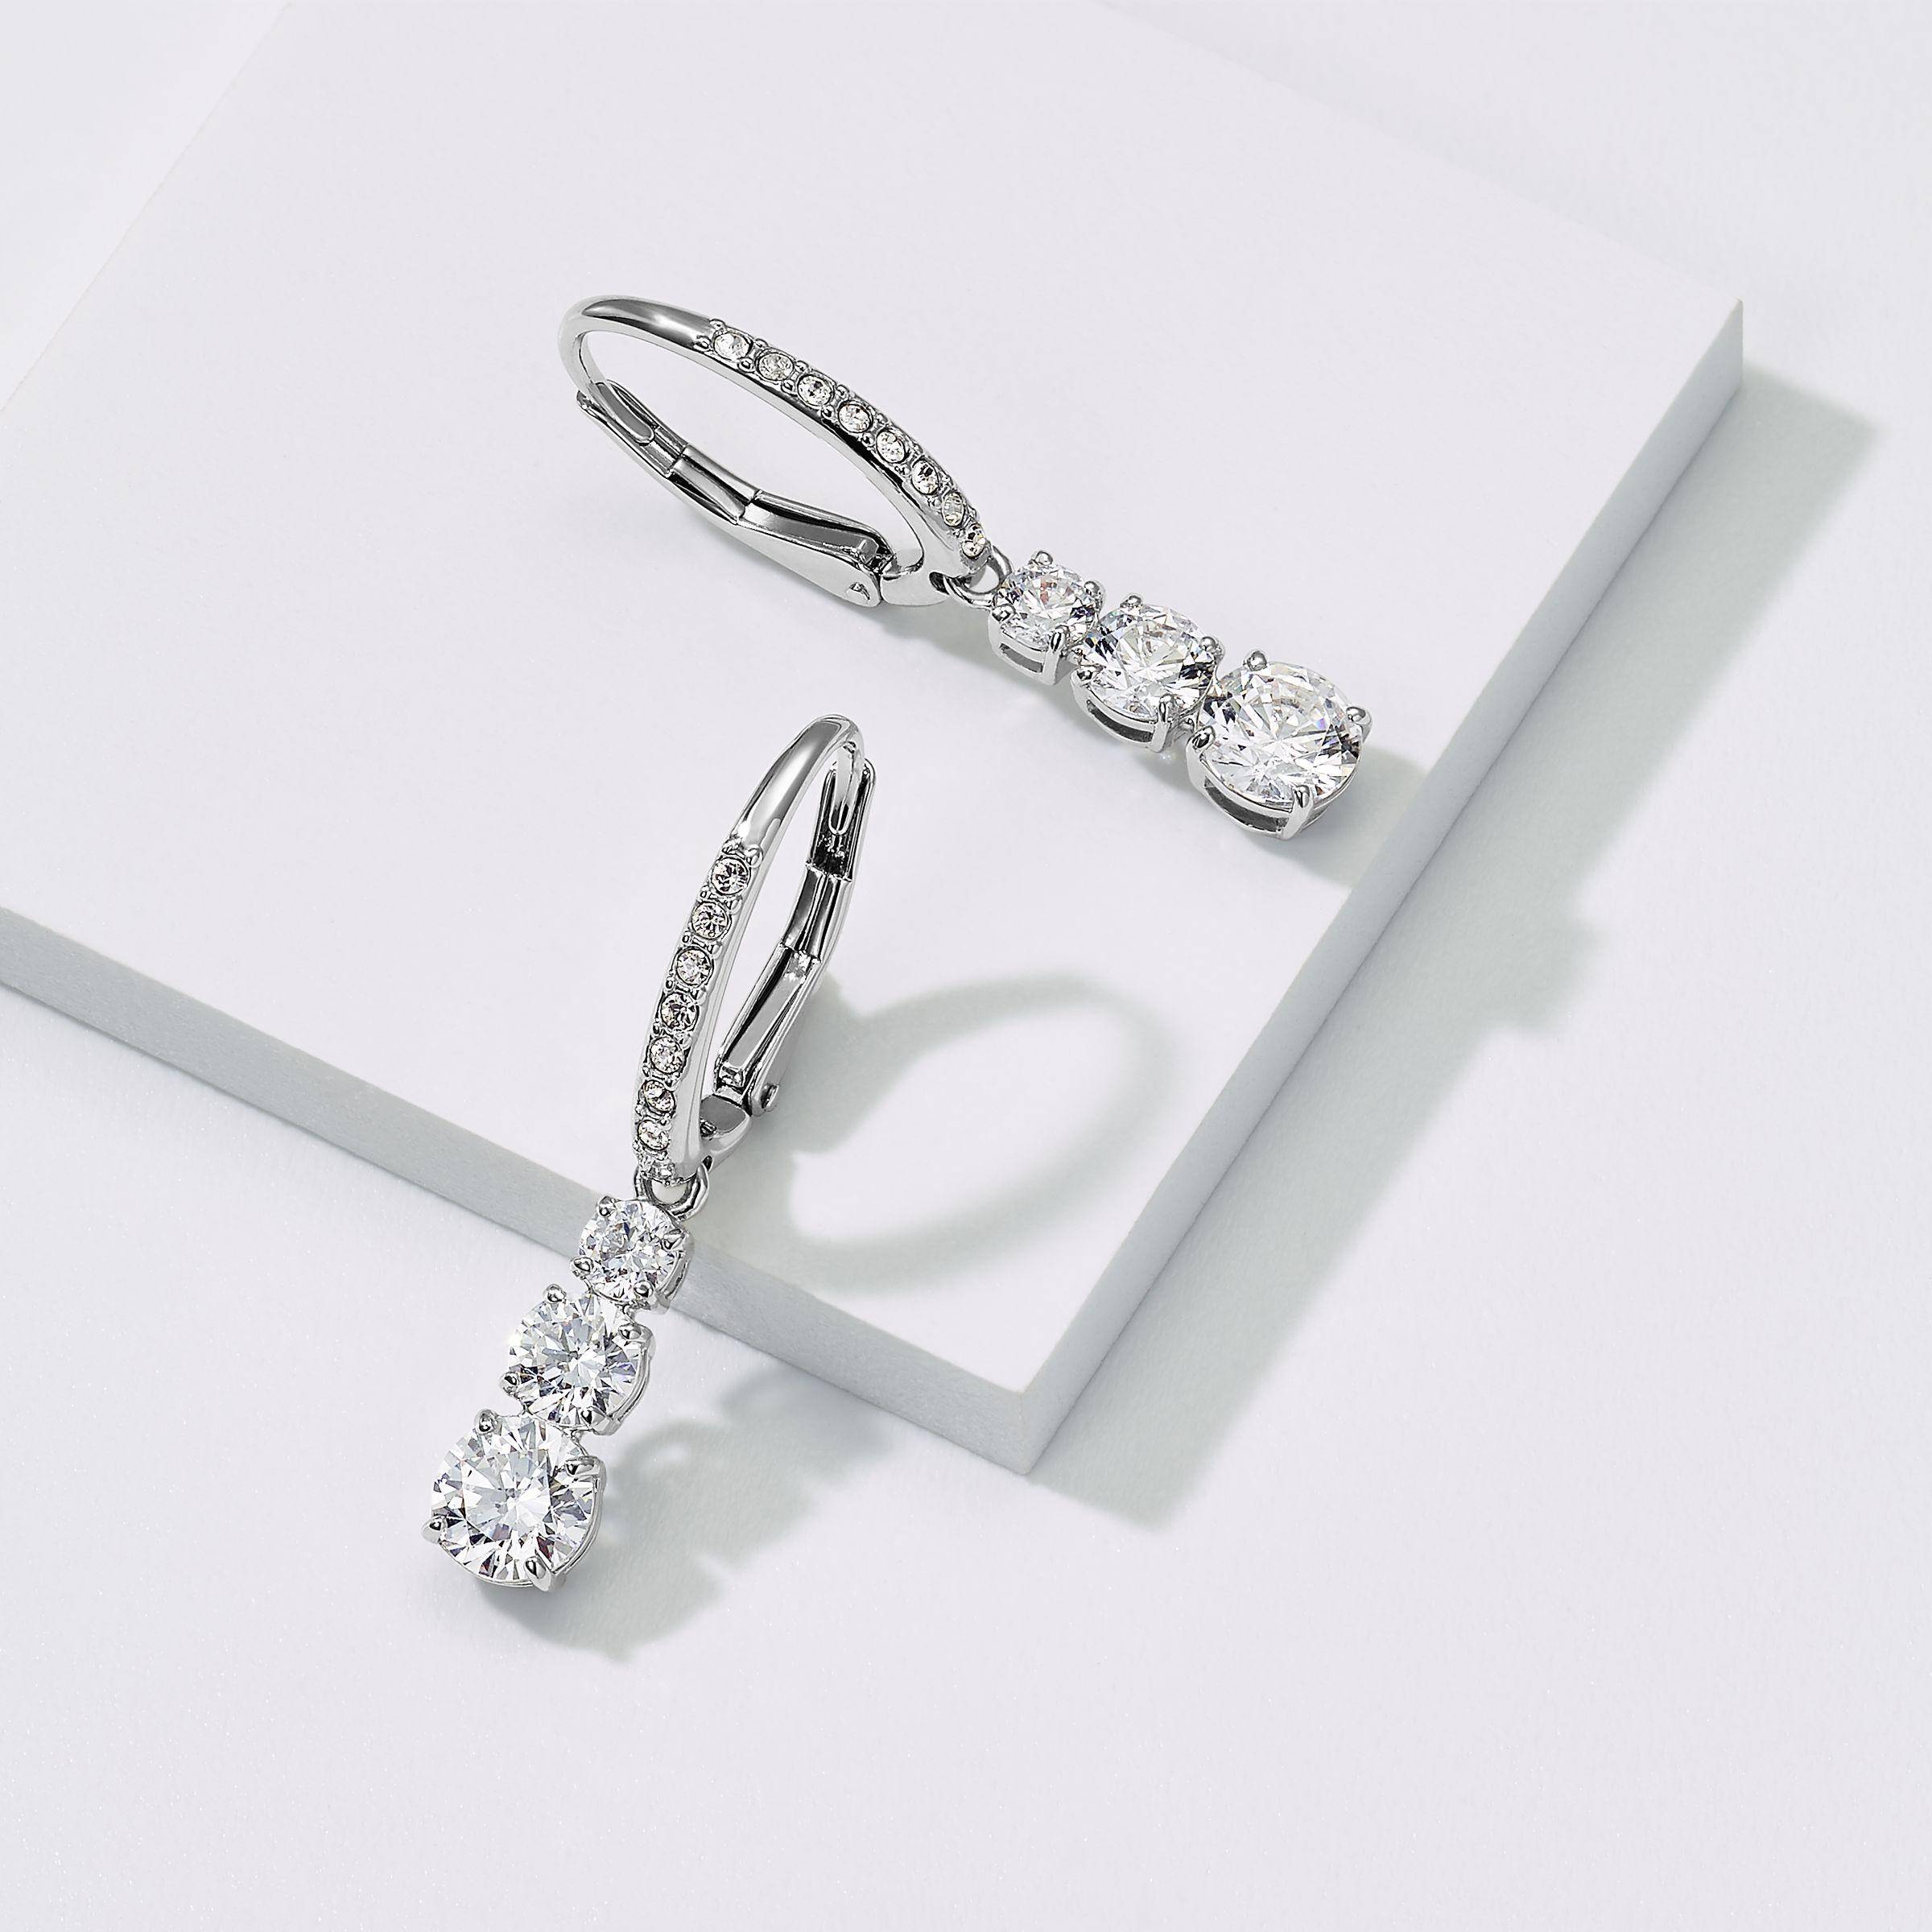 48975cb2f9 Attract Trilogy Round Pierced Earrings, White, Rhodium plating - Swarovski,  5416155